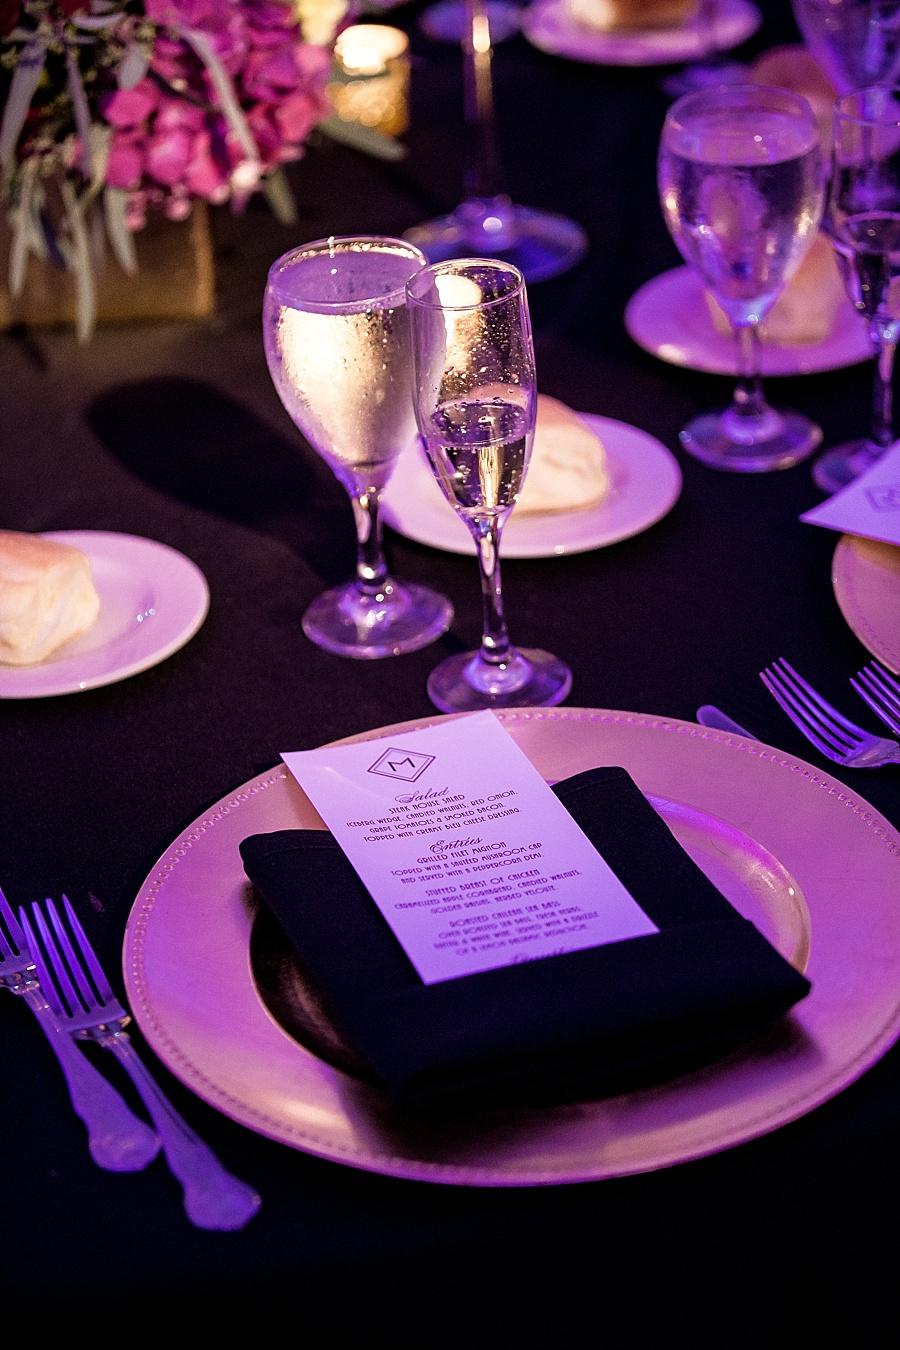 Karmapants_Photography_April_Lynn_Designs_Ballroom_at_the_Ben_Finley_Catering_Luxe_Elegant_Wedding_Art_Deco_Gatsby_Gold_Black_Philadelphia_Reception-107